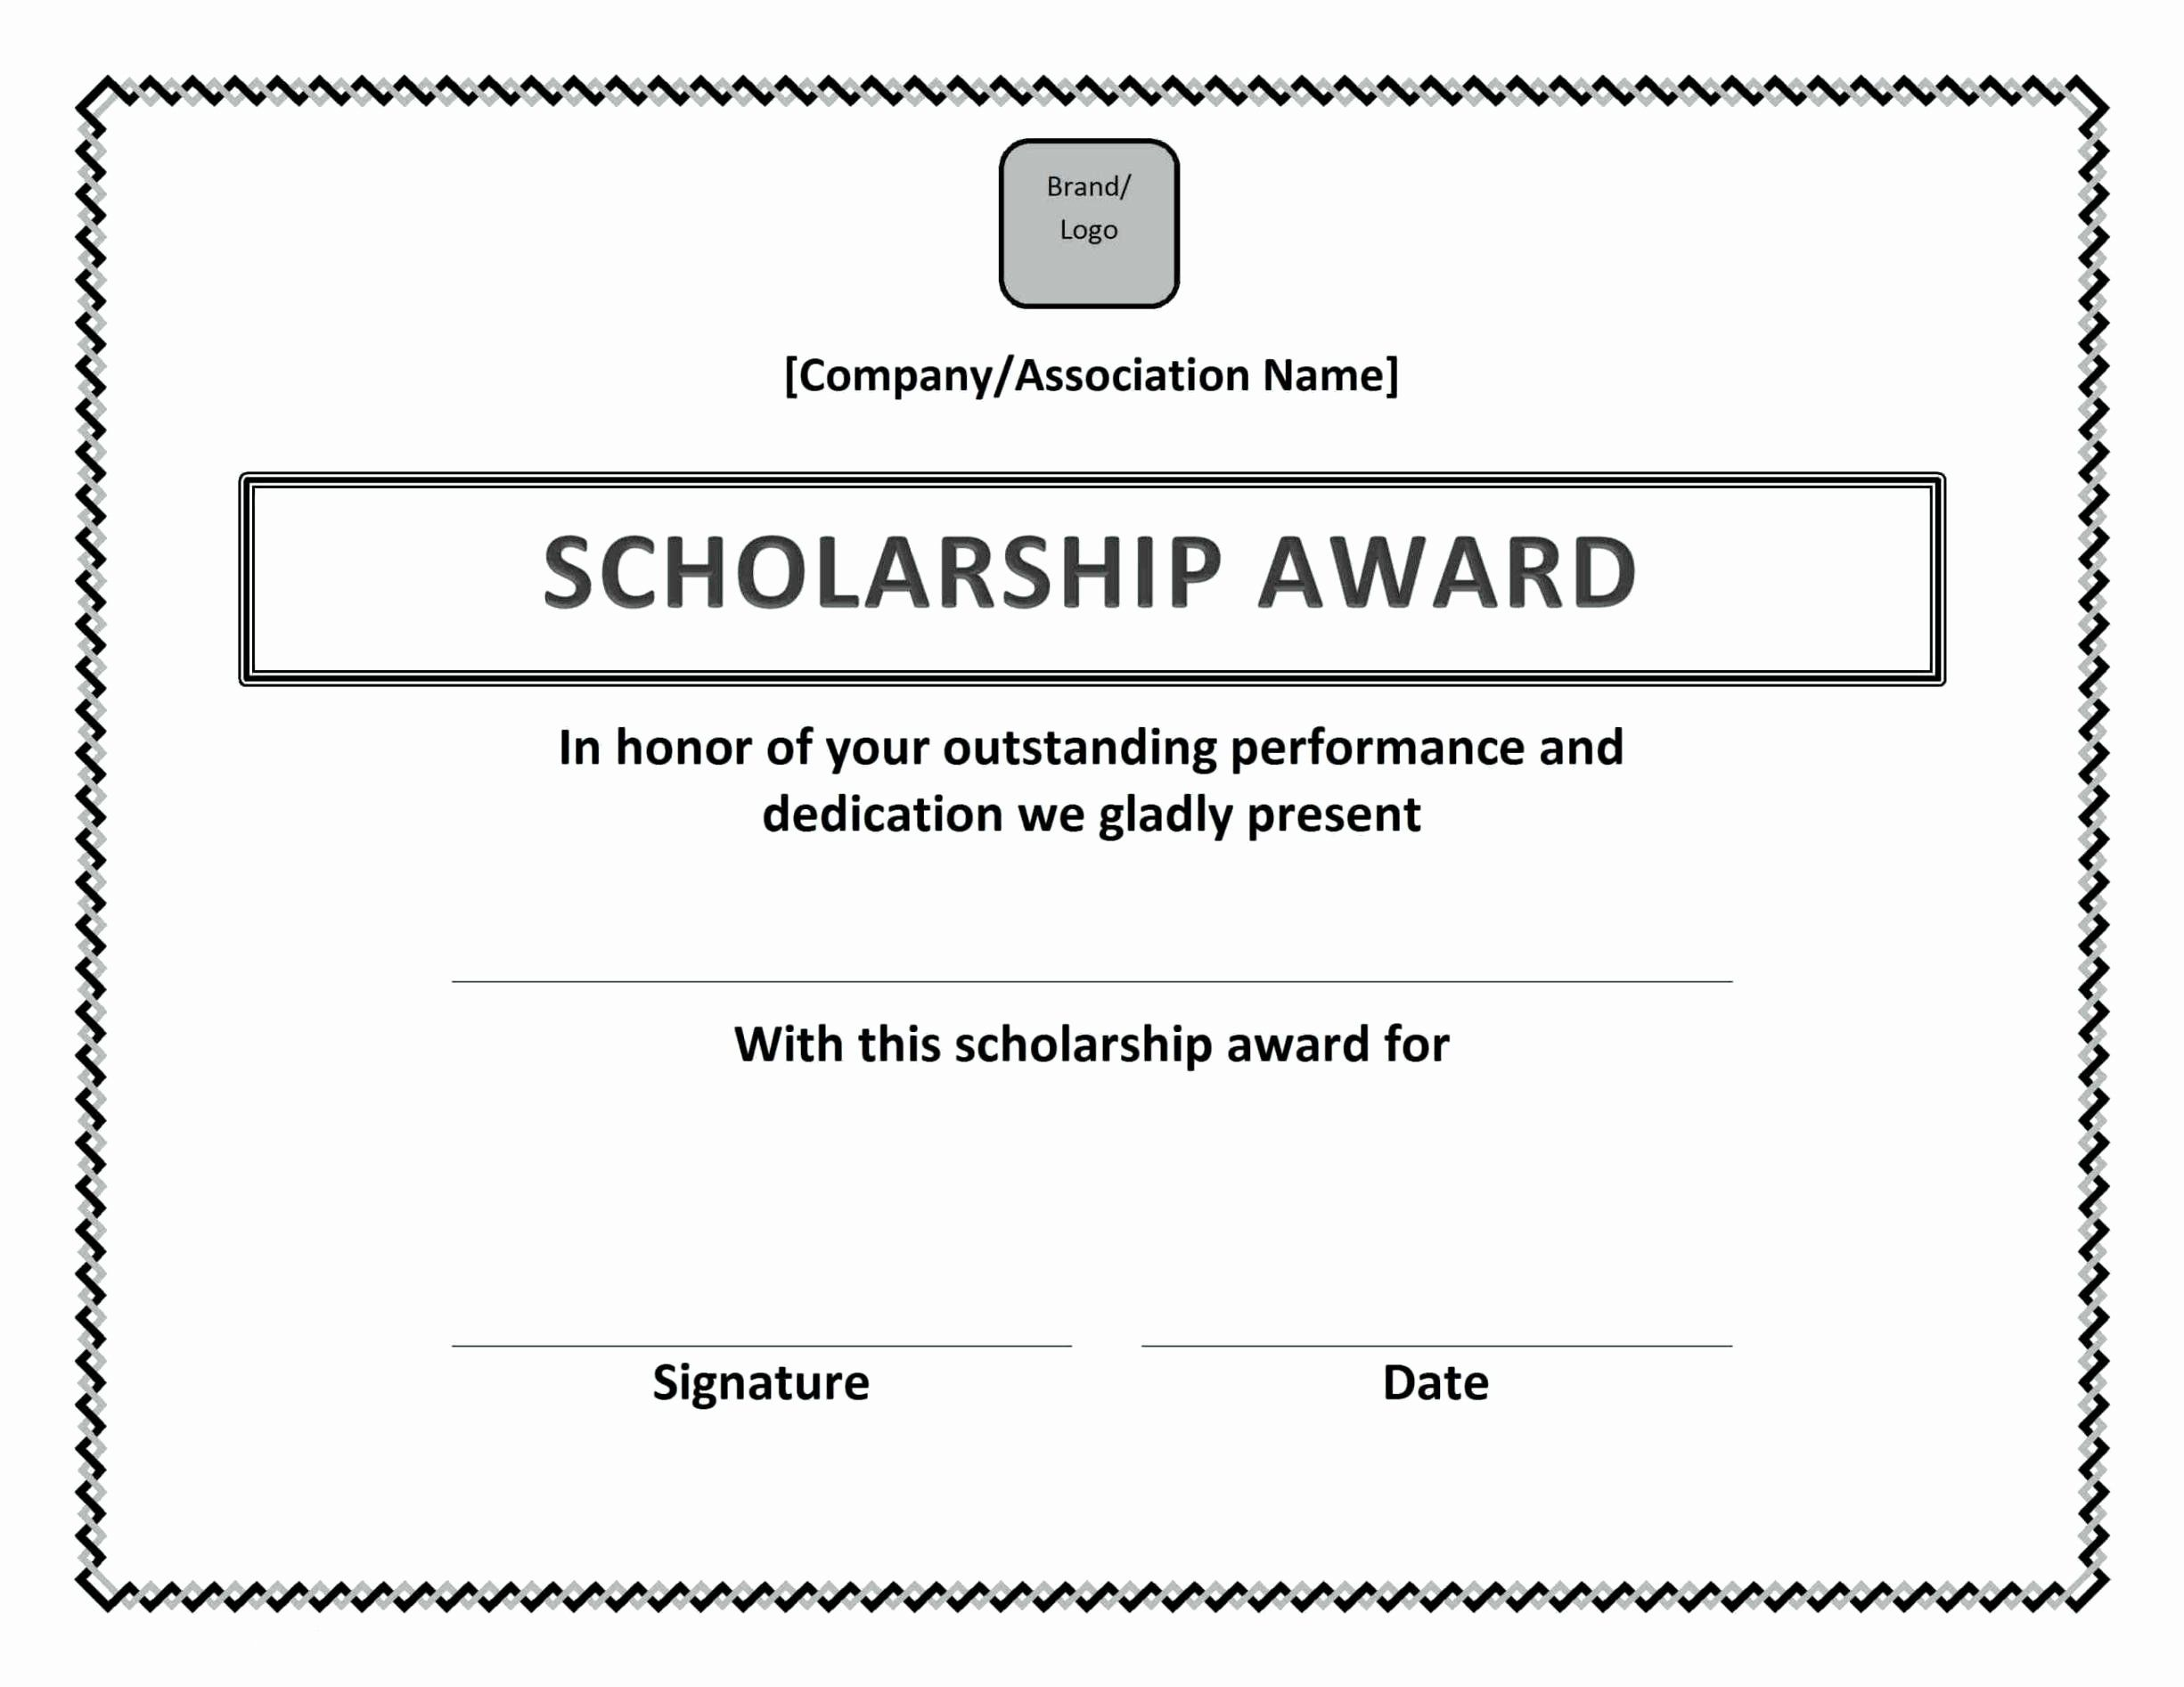 Scholarship Certificates Templates Free Unique Award Certificate Wording Ideas Template Up Awards Certificates Template Scholarships Birth Certificate Template Above and beyond certificate template